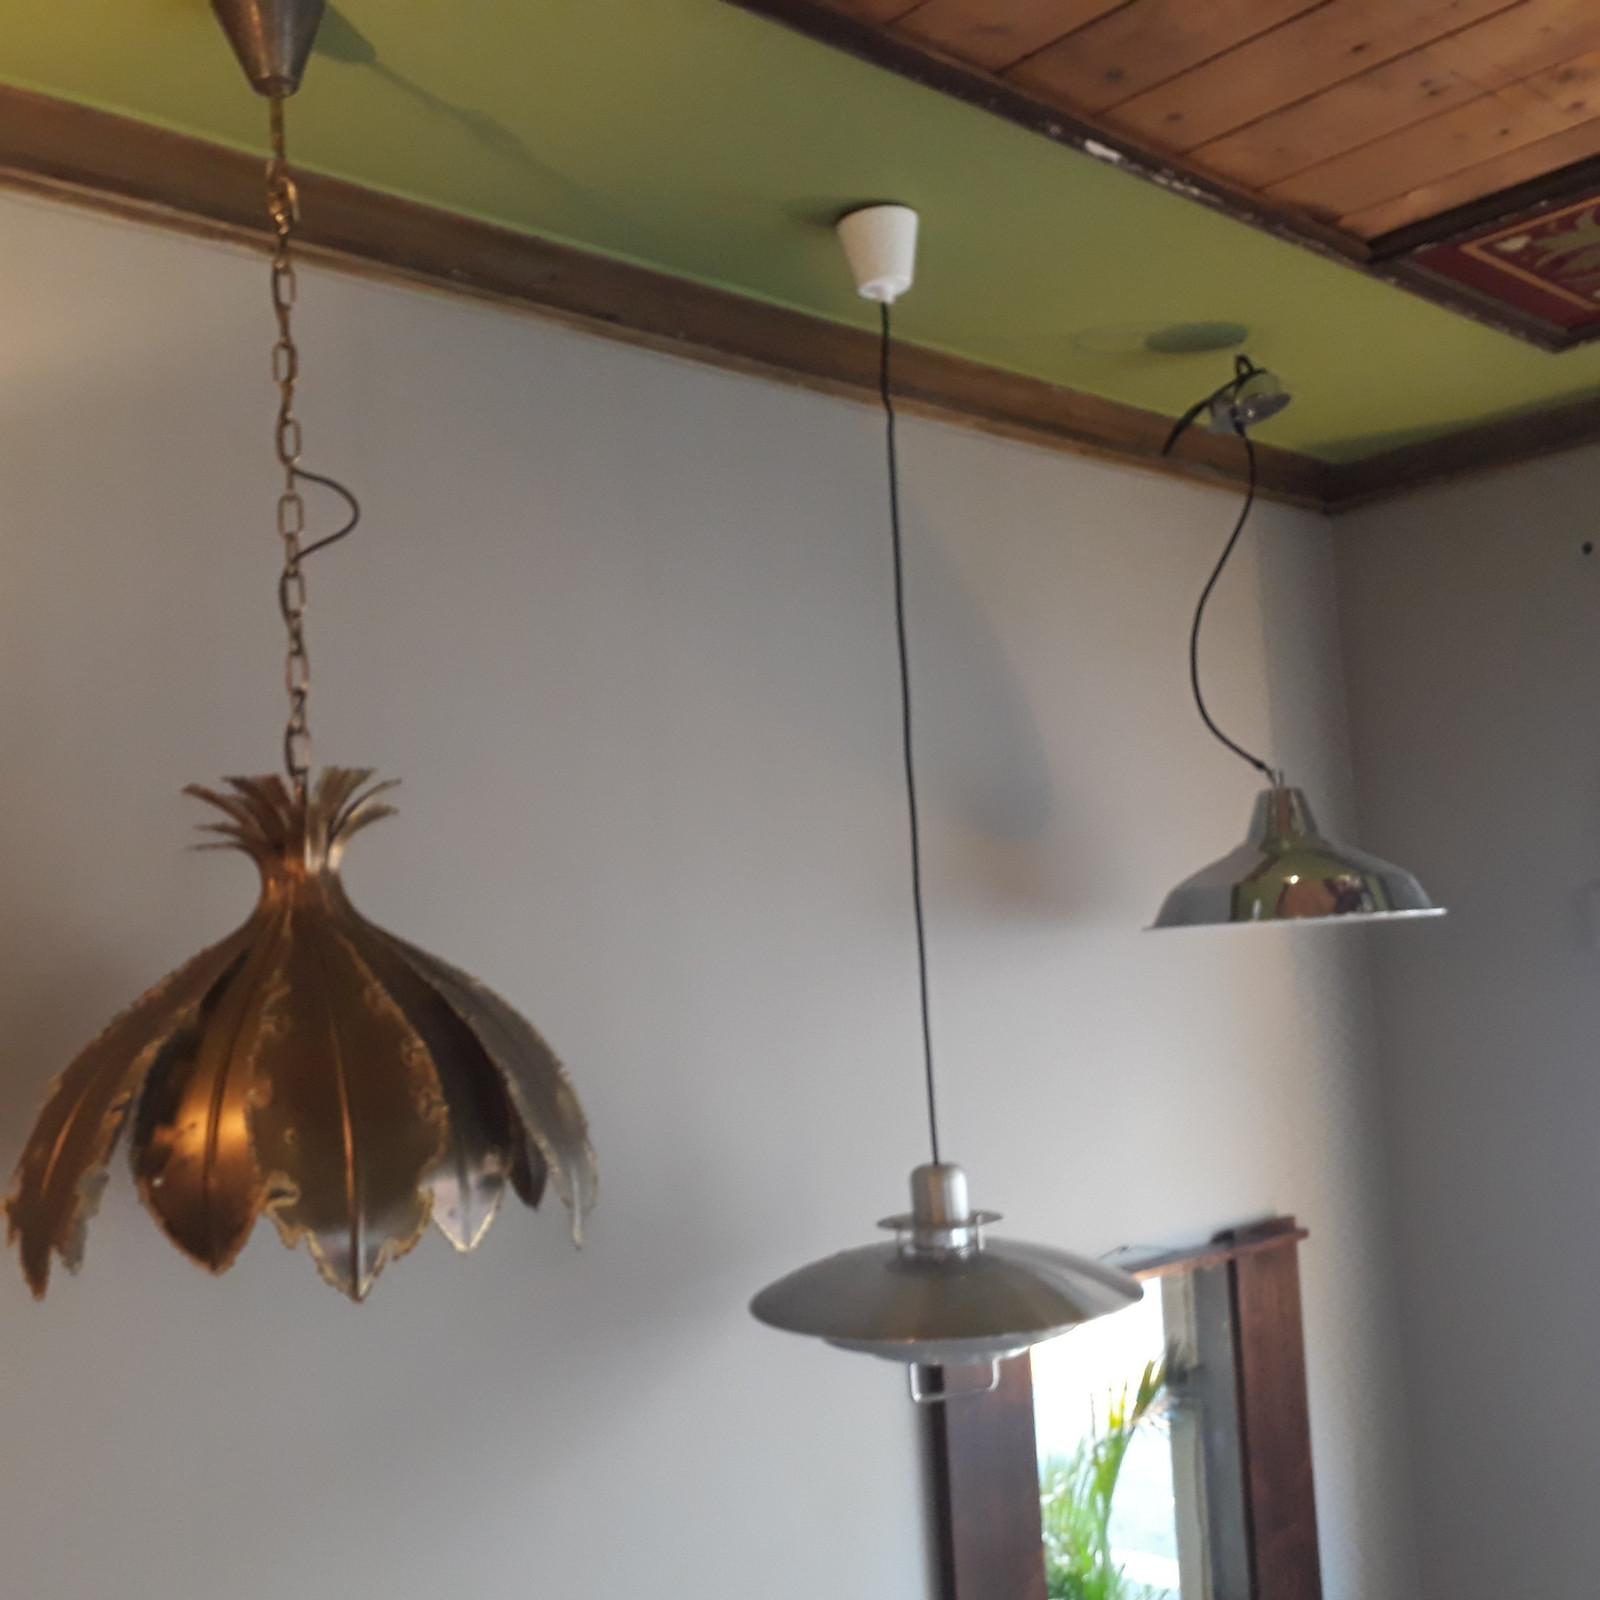 gamle lamper med rådyr